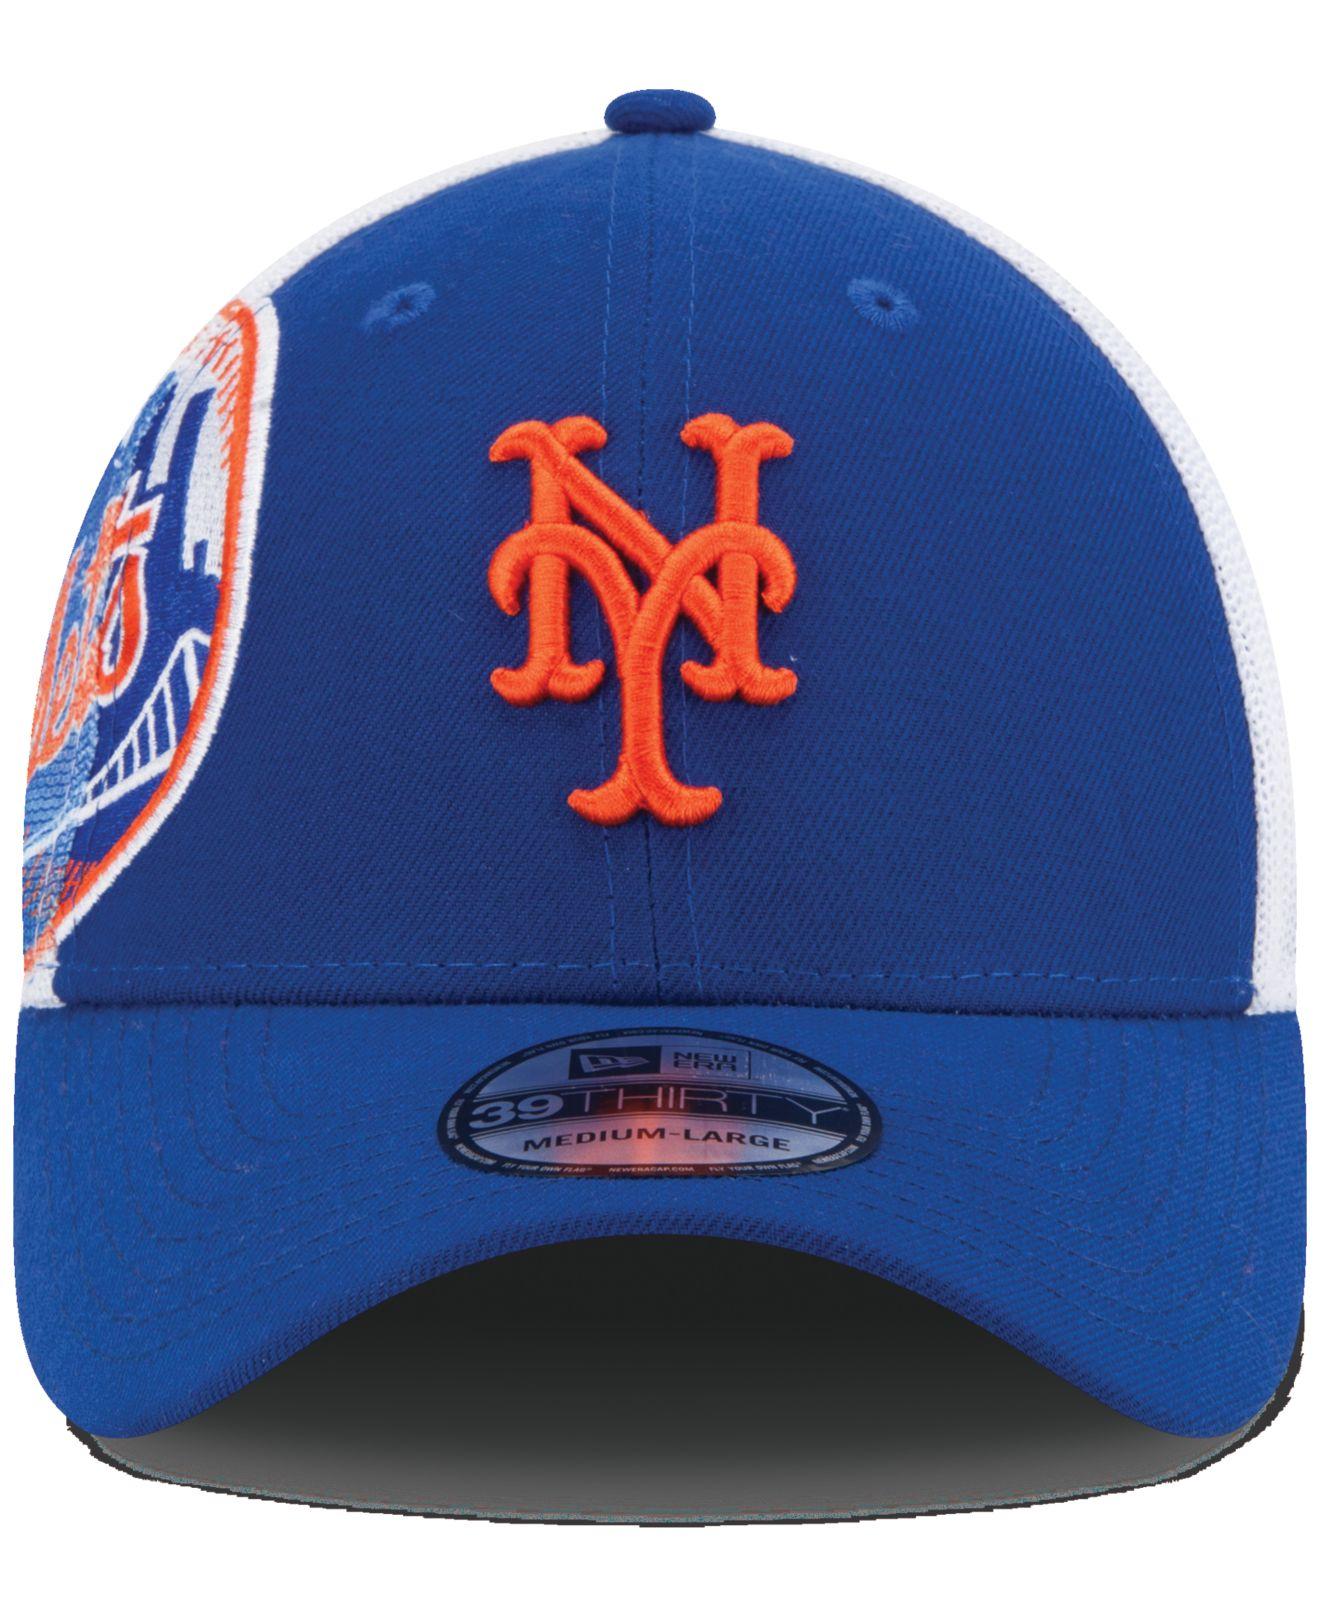 ... shopping lyst ktz new york mets double mesh 39thirty cap in blue for men  c017b d7ab7 3884f26fa0c7